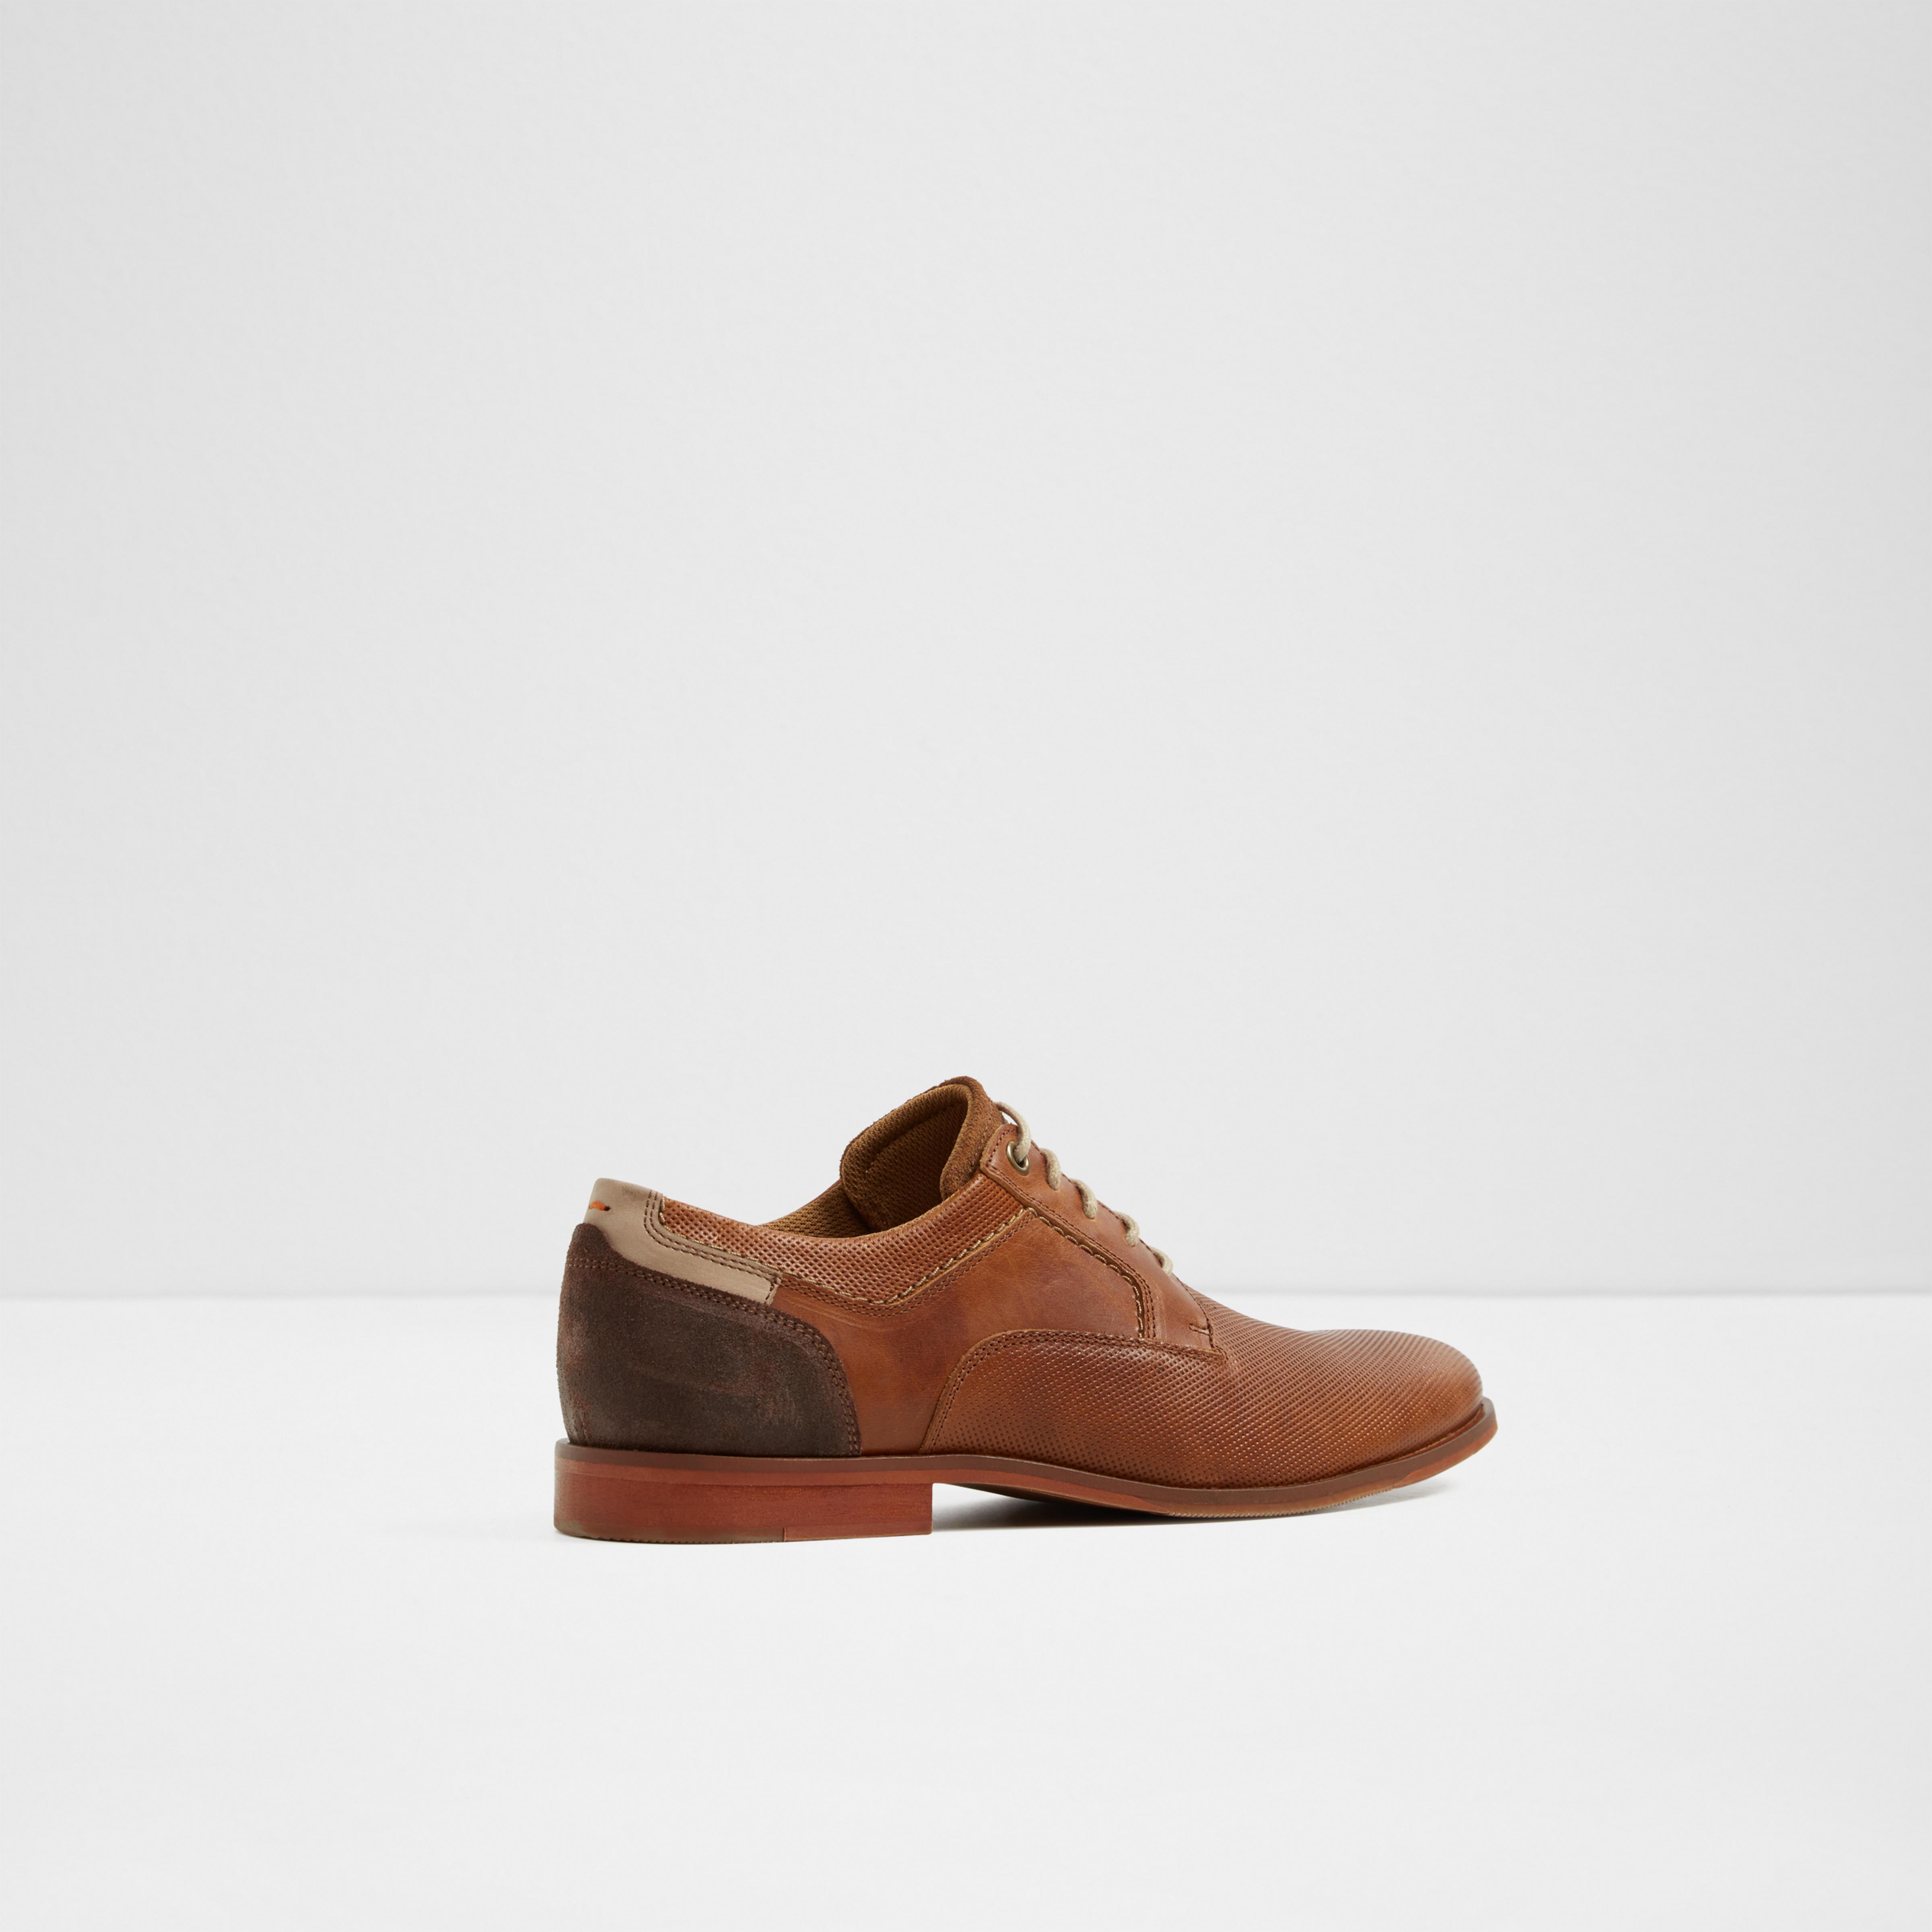 ALDO Leather Grilille in Cognac (Brown) for Men